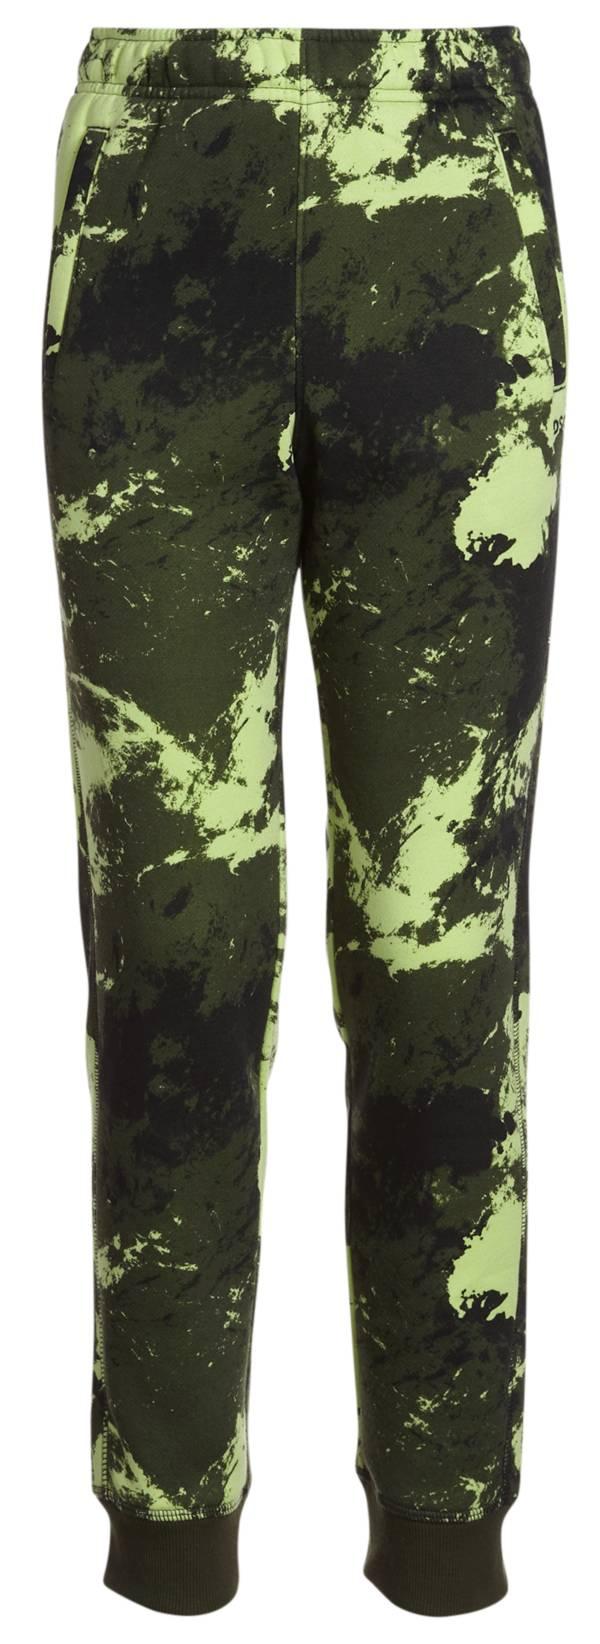 DSG Boys' Fleece Joggers product image